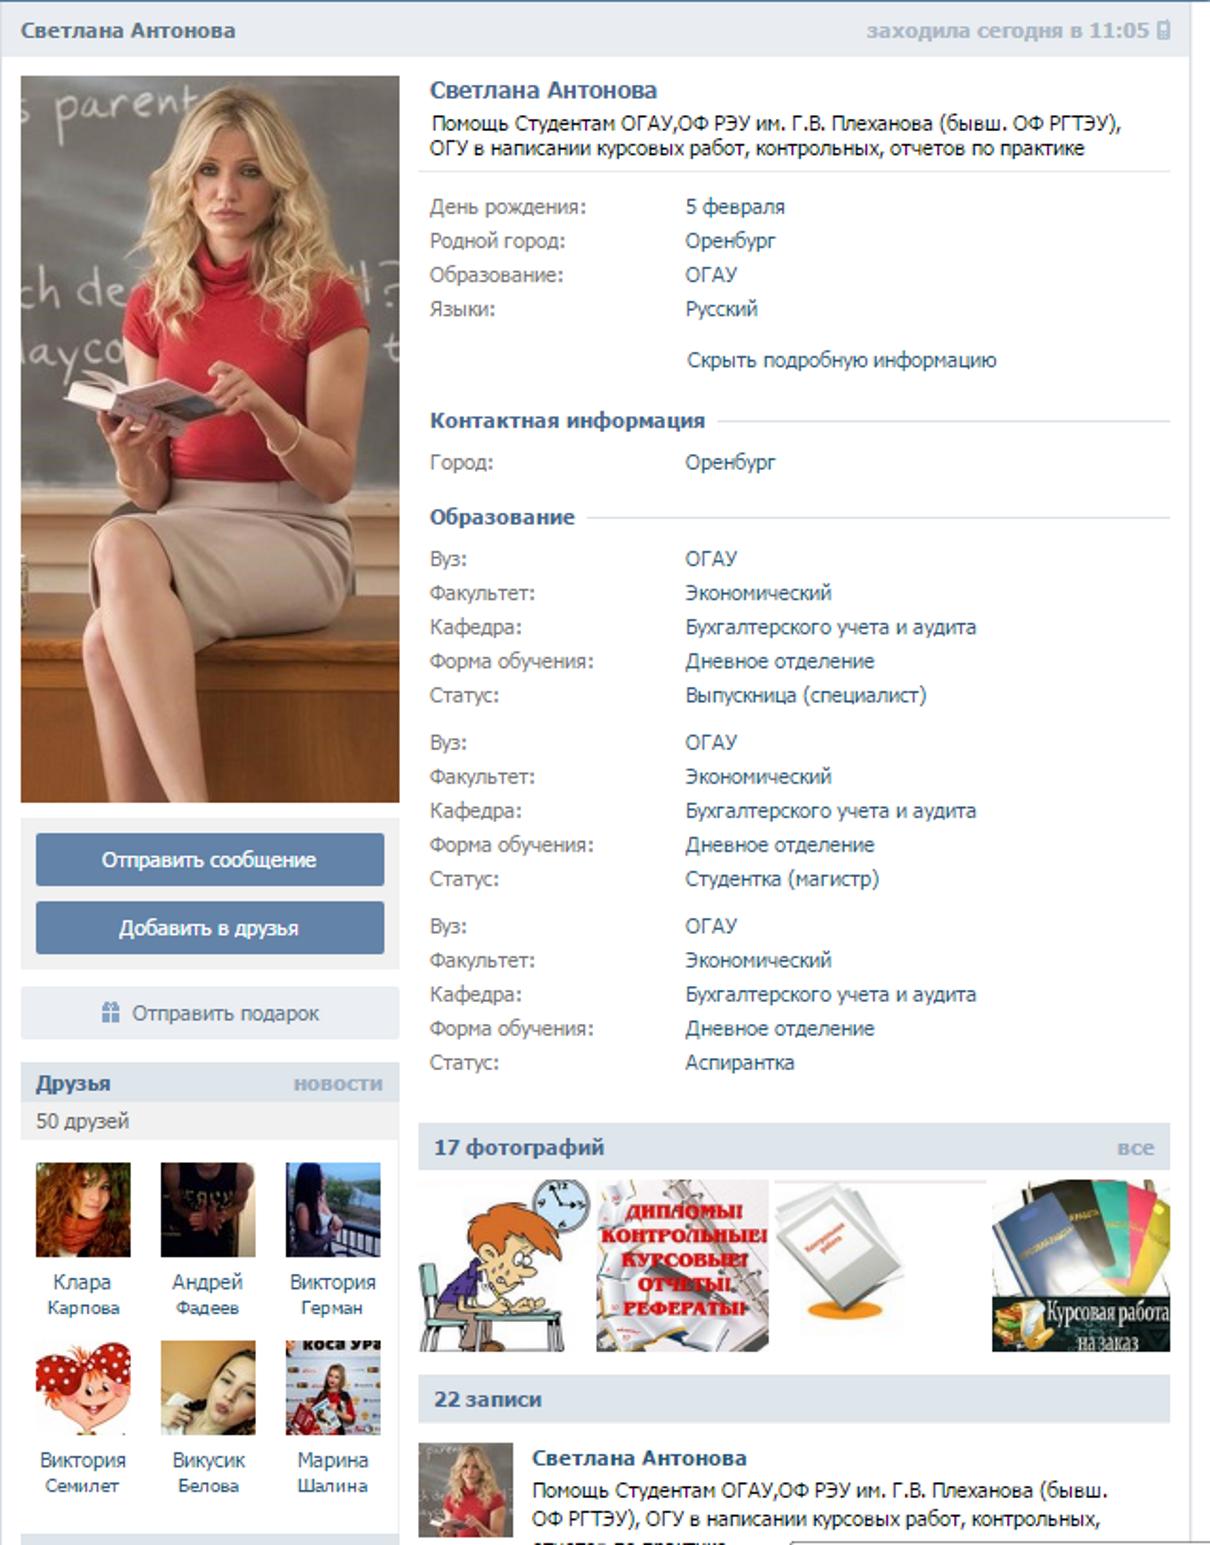 Жалоба-отзыв: Енидеркина Светлана (Svetlana Eniderkina - https://vk.com/id29044587) - Кидает на деньги!.  Фото №2